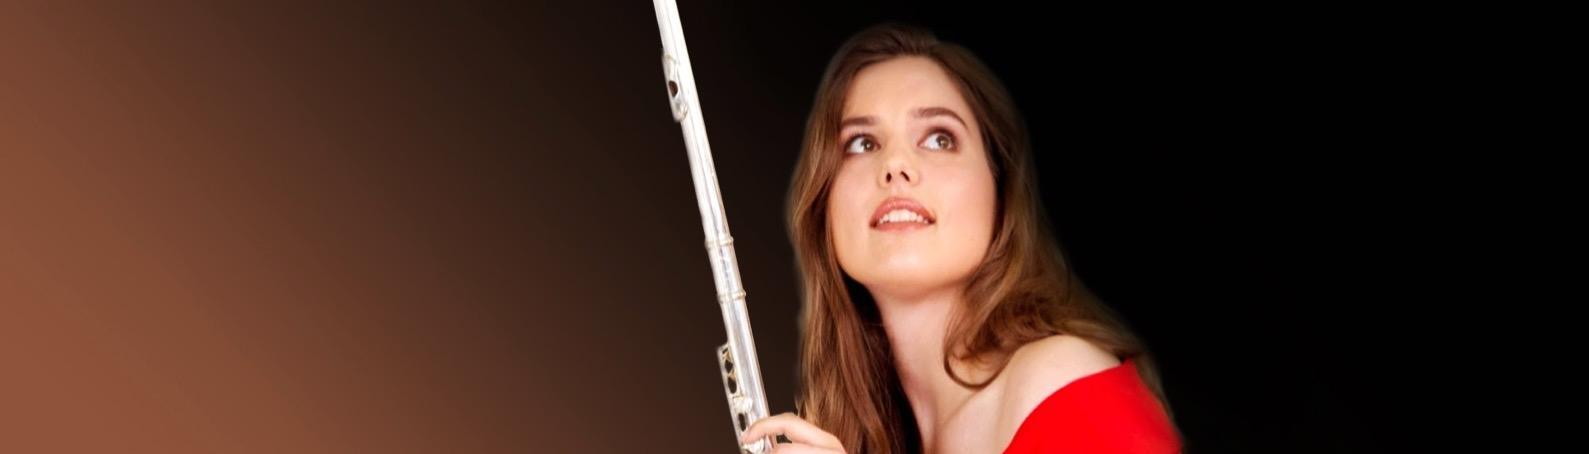 Praktijkorkest i.k.v. eindexamen Beate Matvejeva (Master examen fluit)